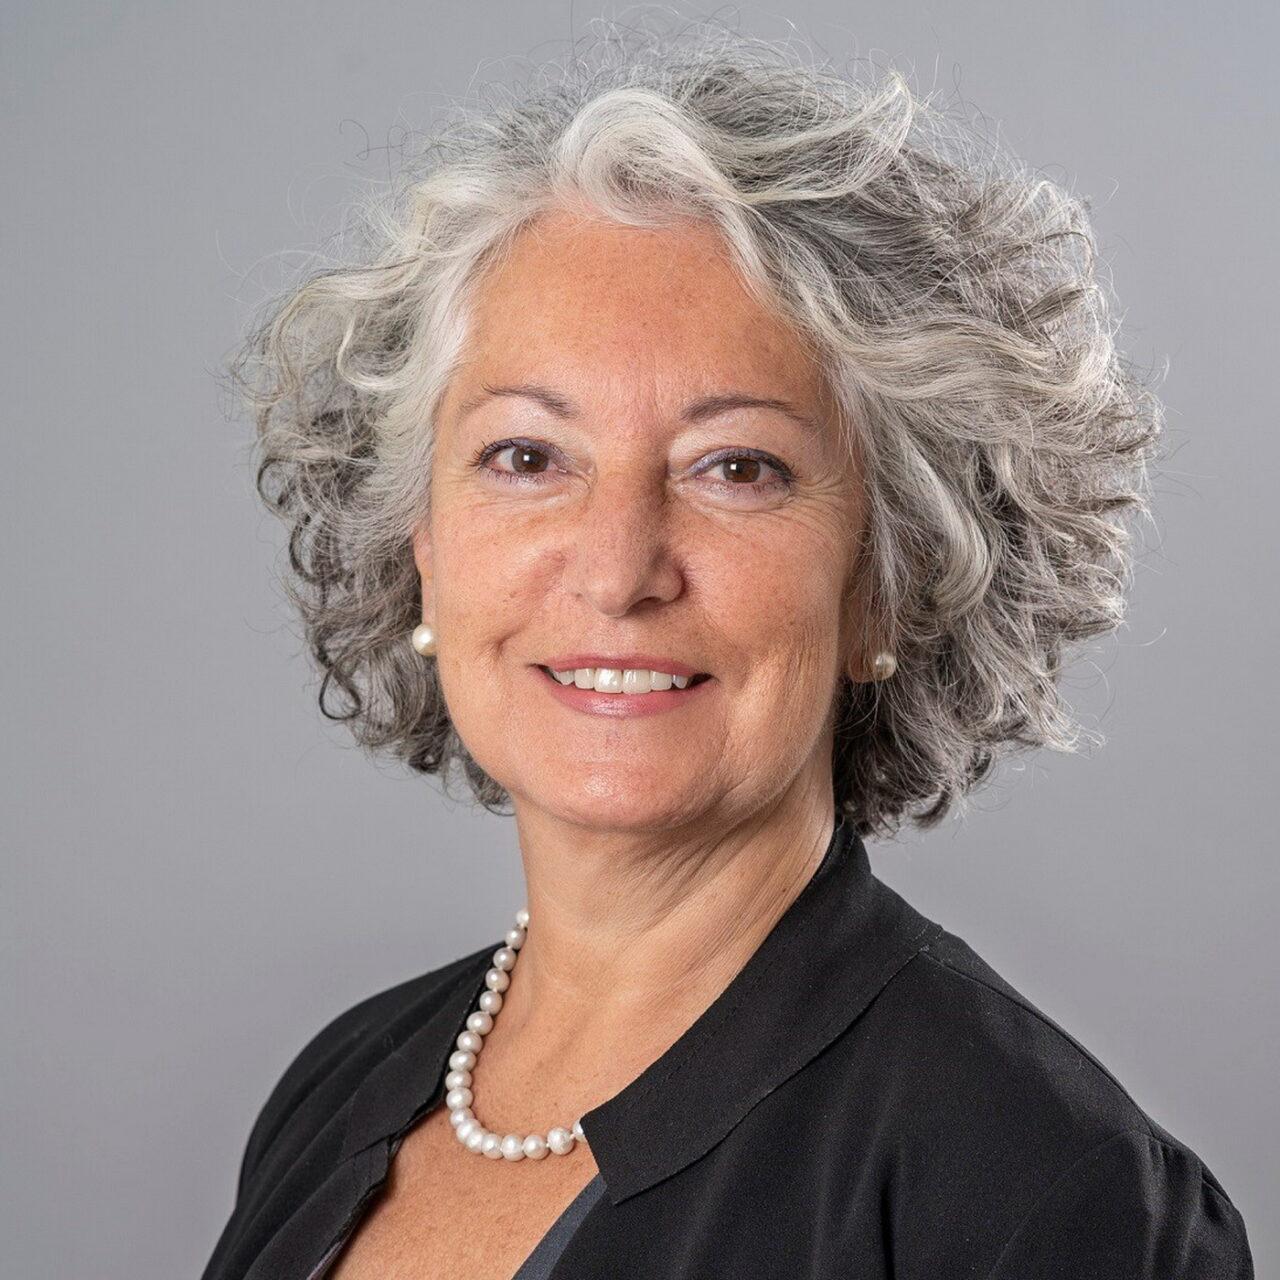 Neue Director Finance bei KINGSTONE Real Estate